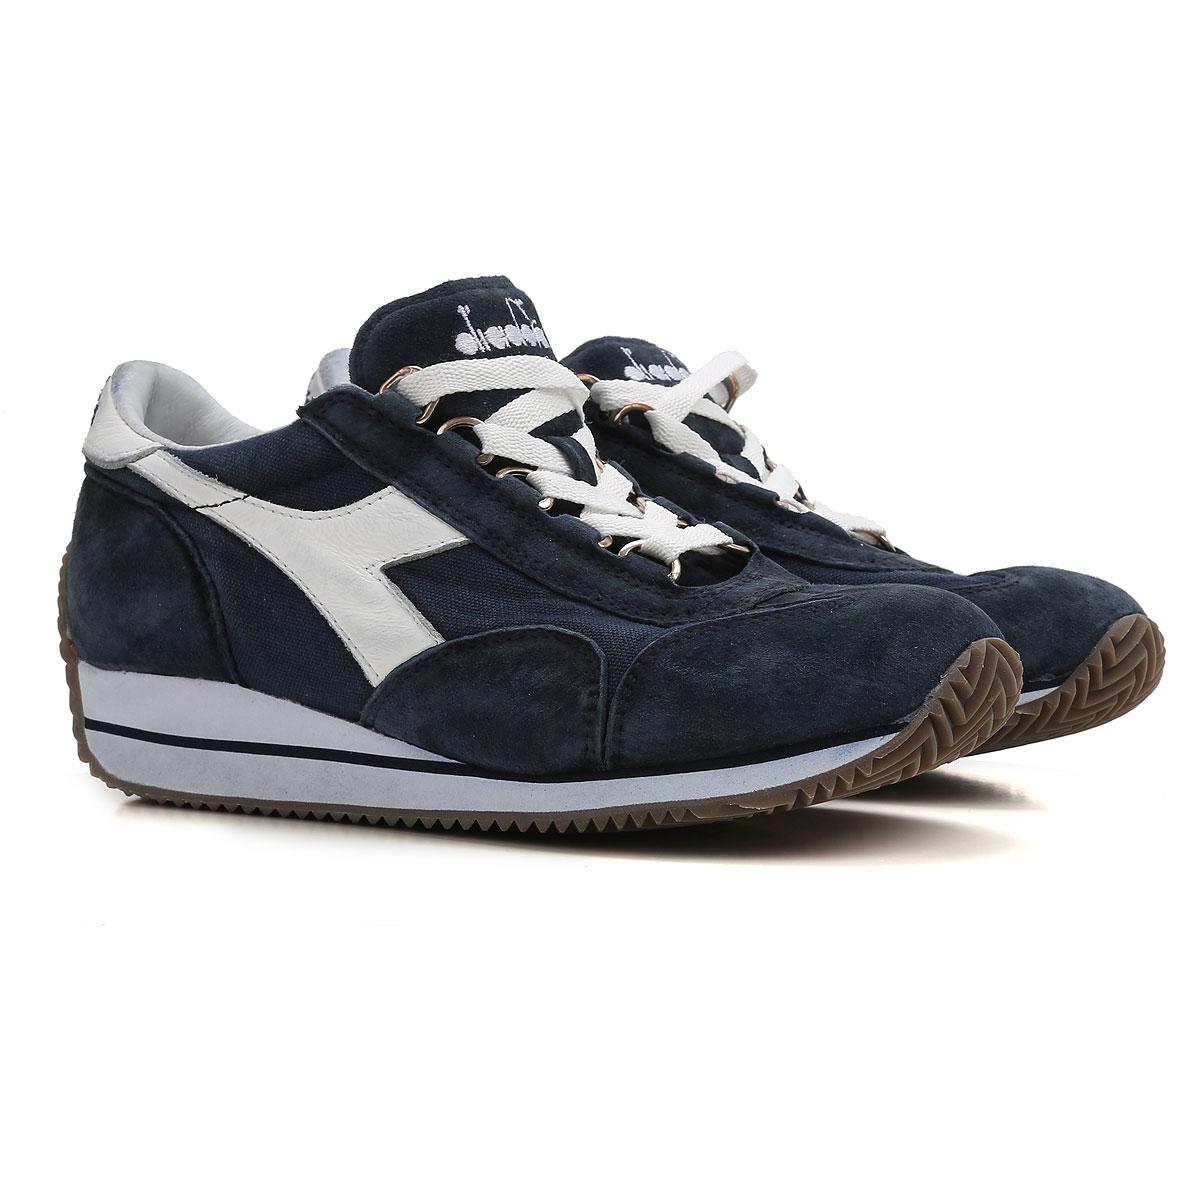 Womens Shoes Diadora Style code 156030c2074woman 397139